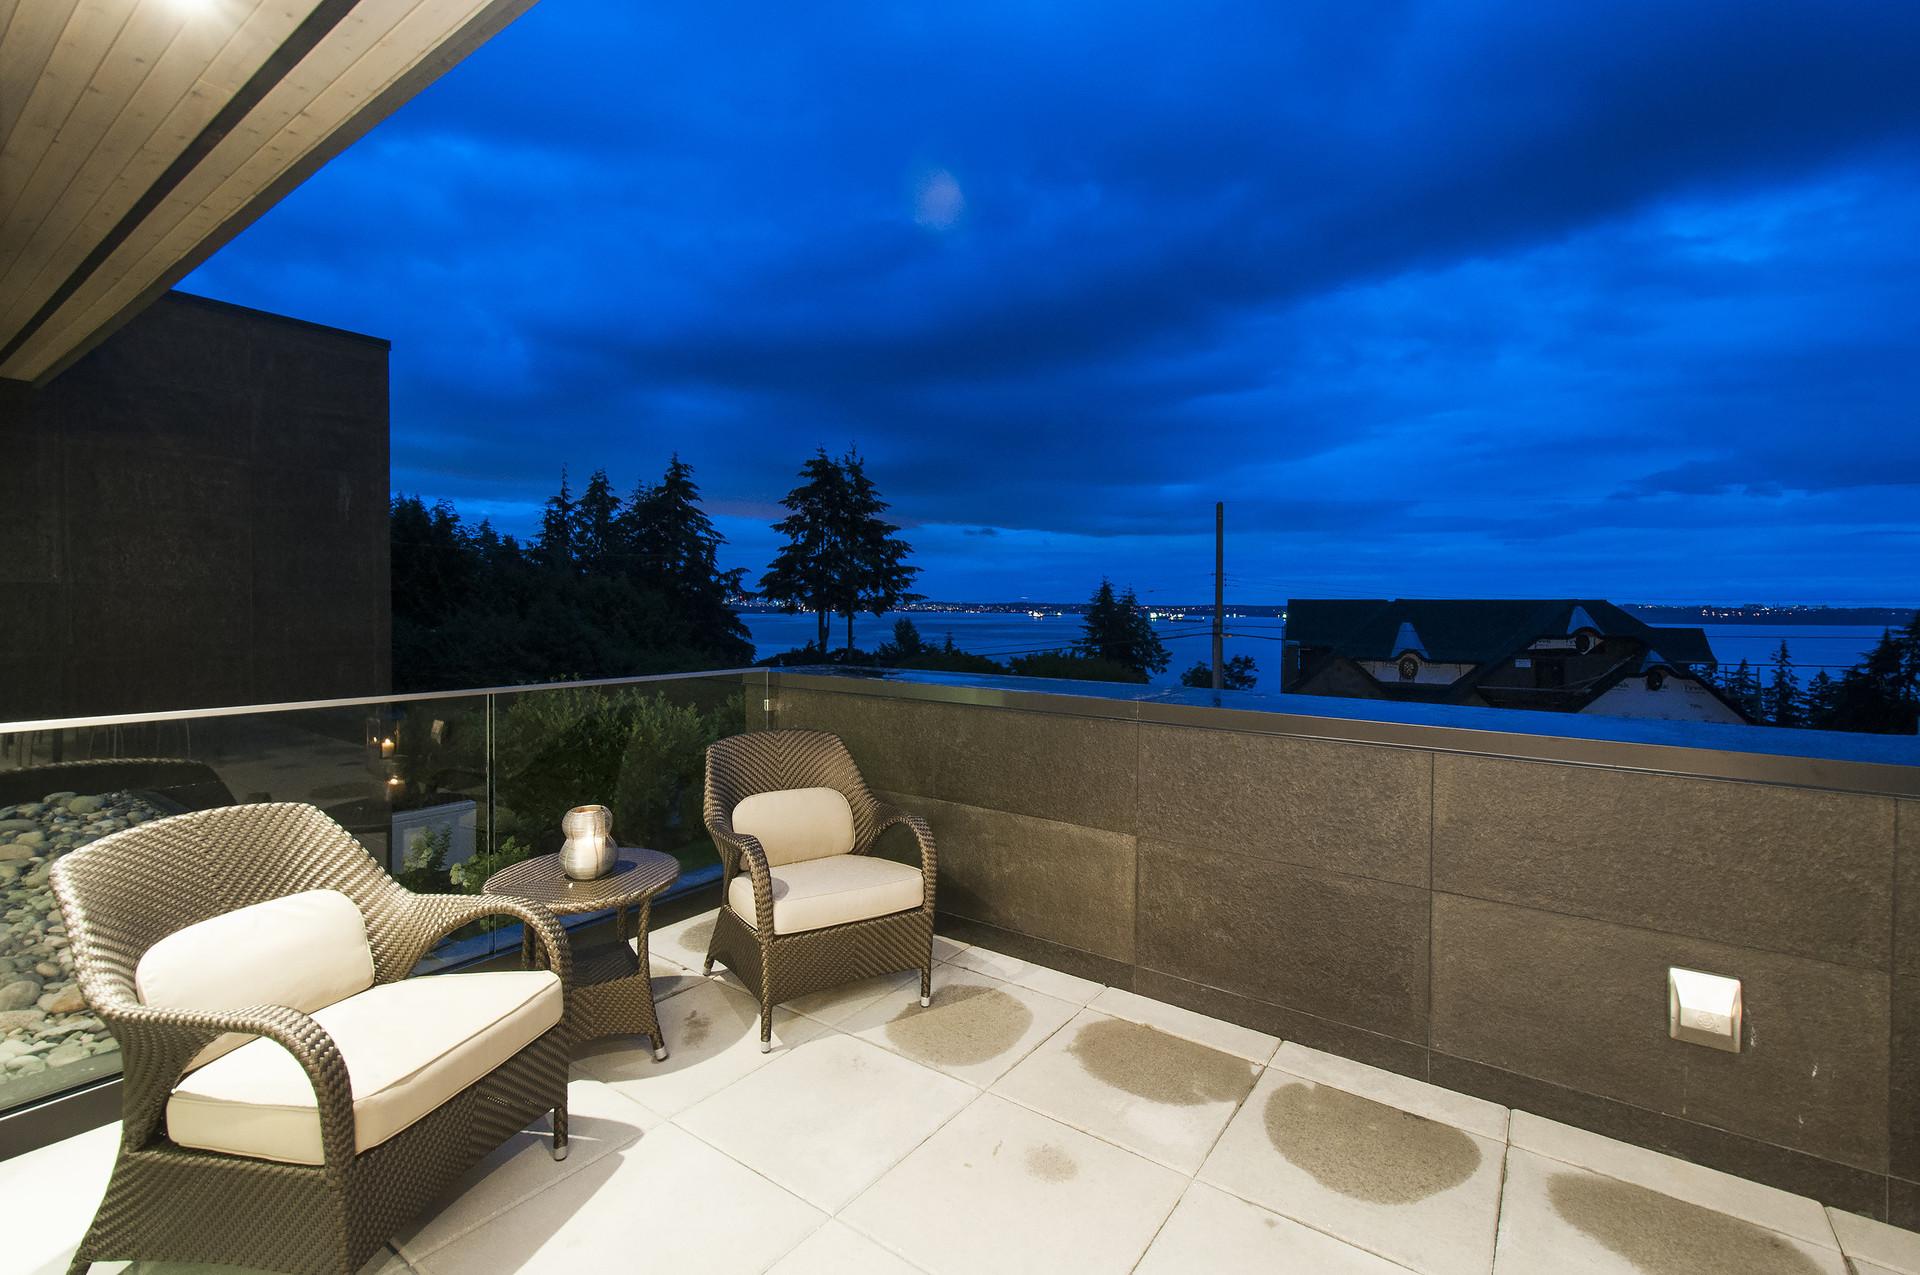 022 at 4113 Bayridge Avenue, Bayridge, West Vancouver